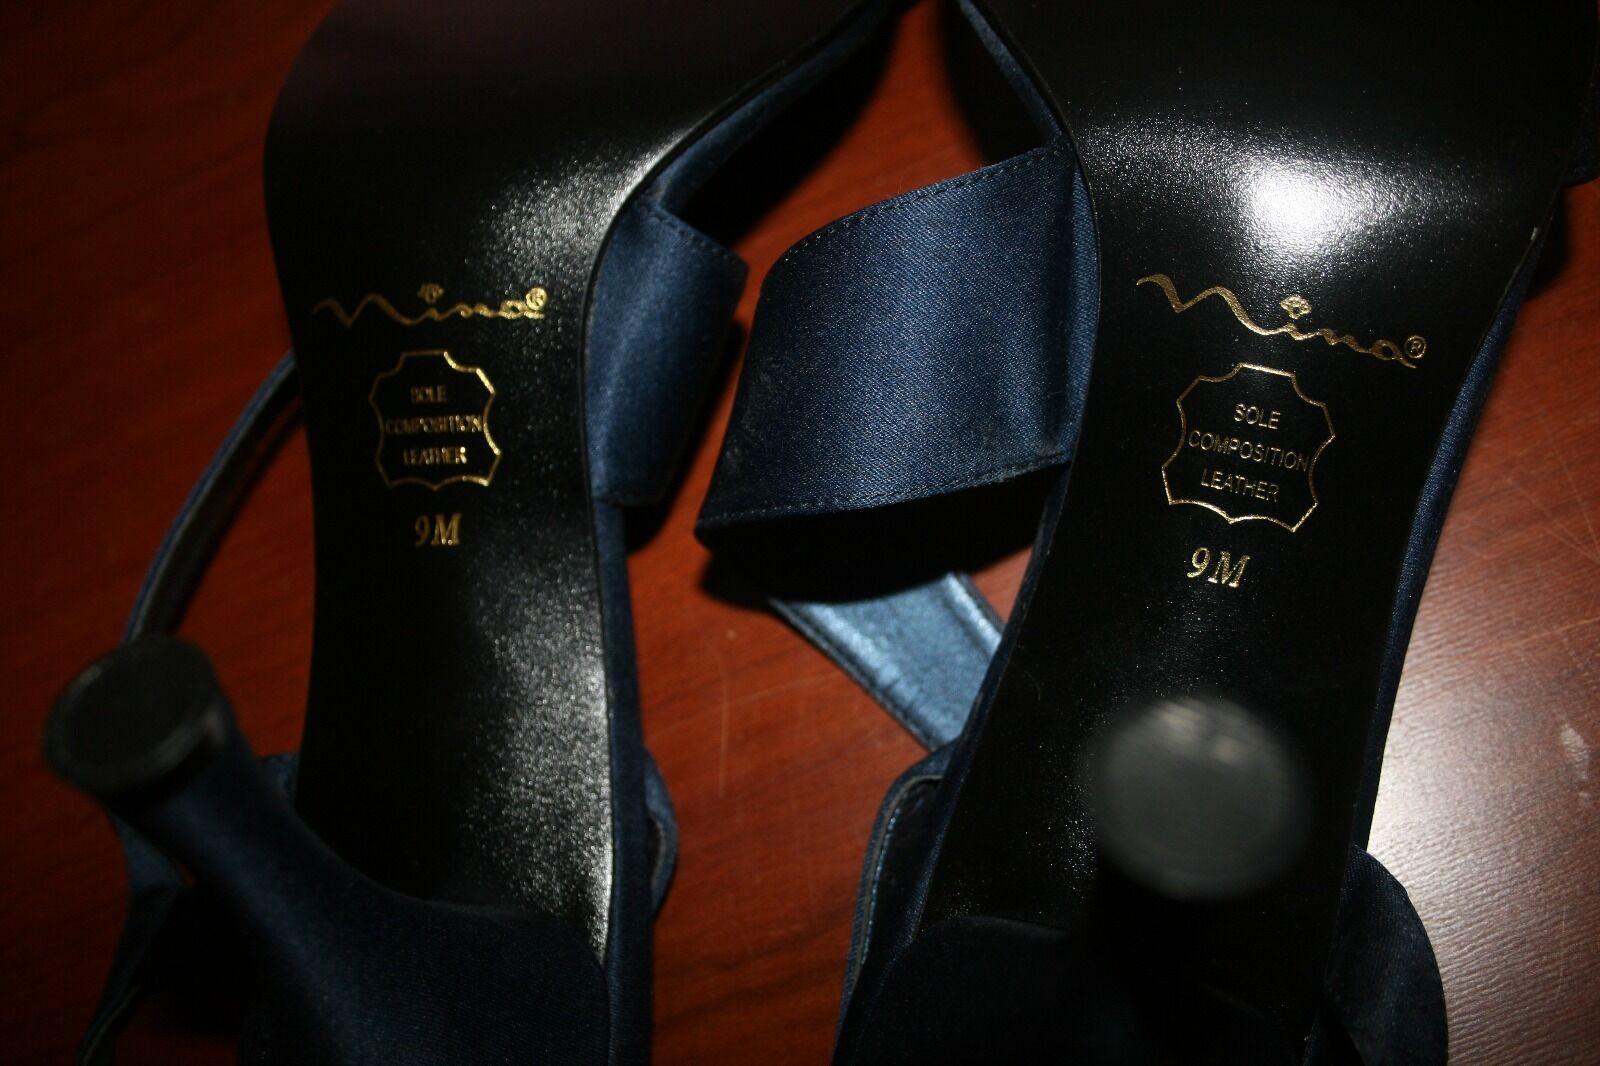 Nina New Shoes in Box High Heel Shoes New 8 1/2 Medium (M) c21a75